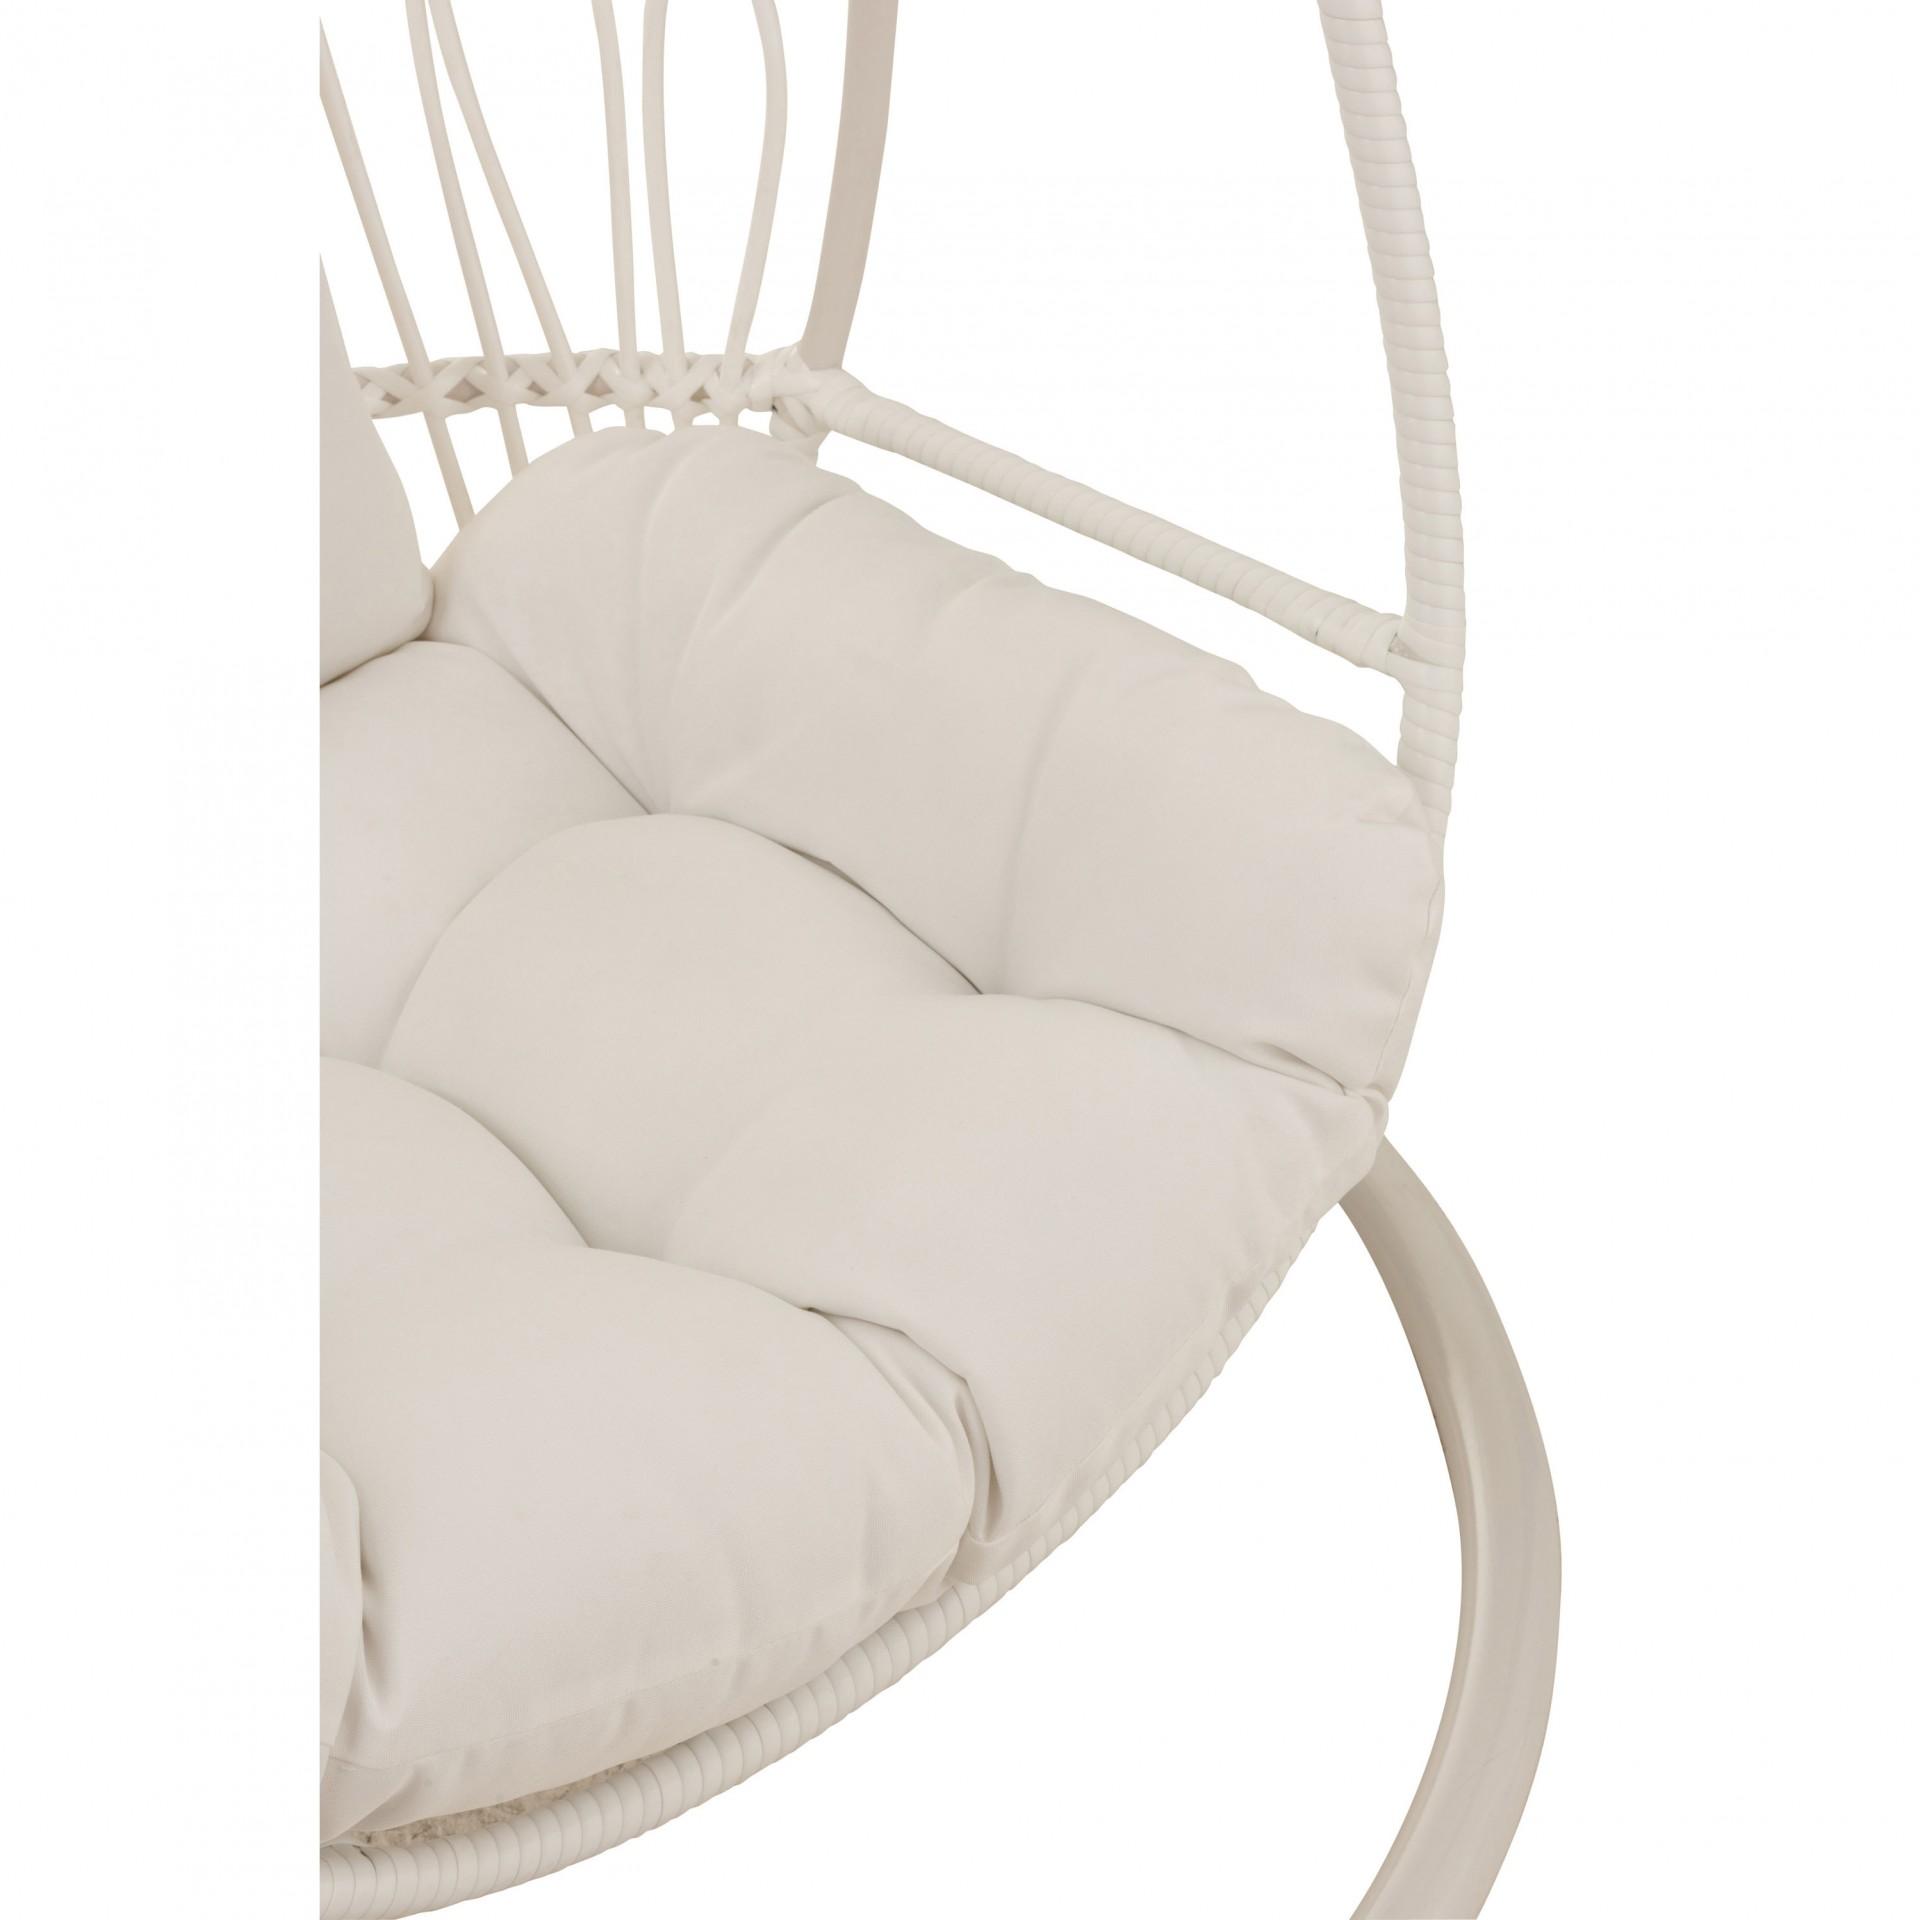 Cadeira suspensa c/base, metal/vime, branco, 113x103x197